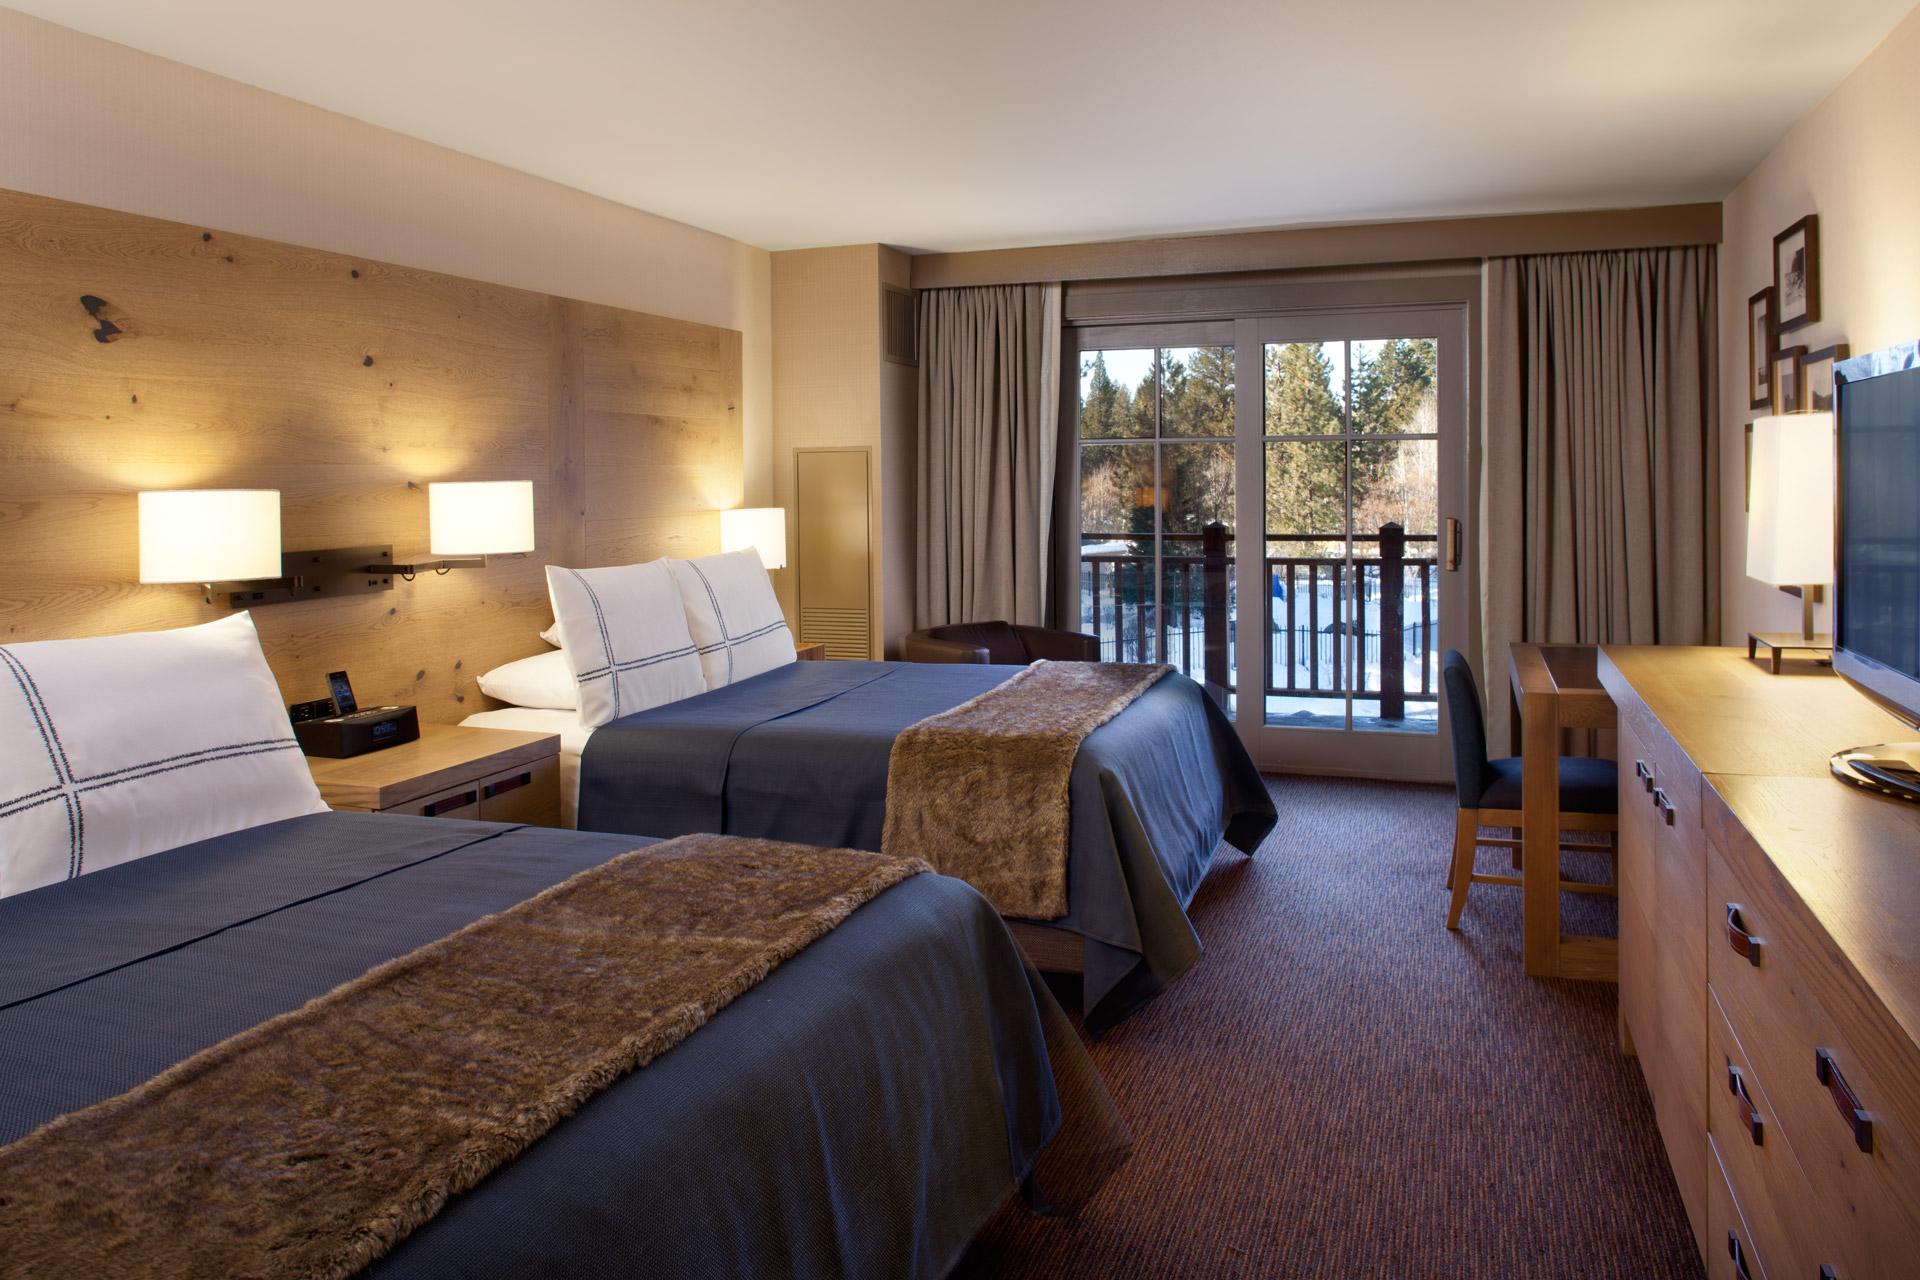 Hyatt Lake Tahoe Guestrooms interiors